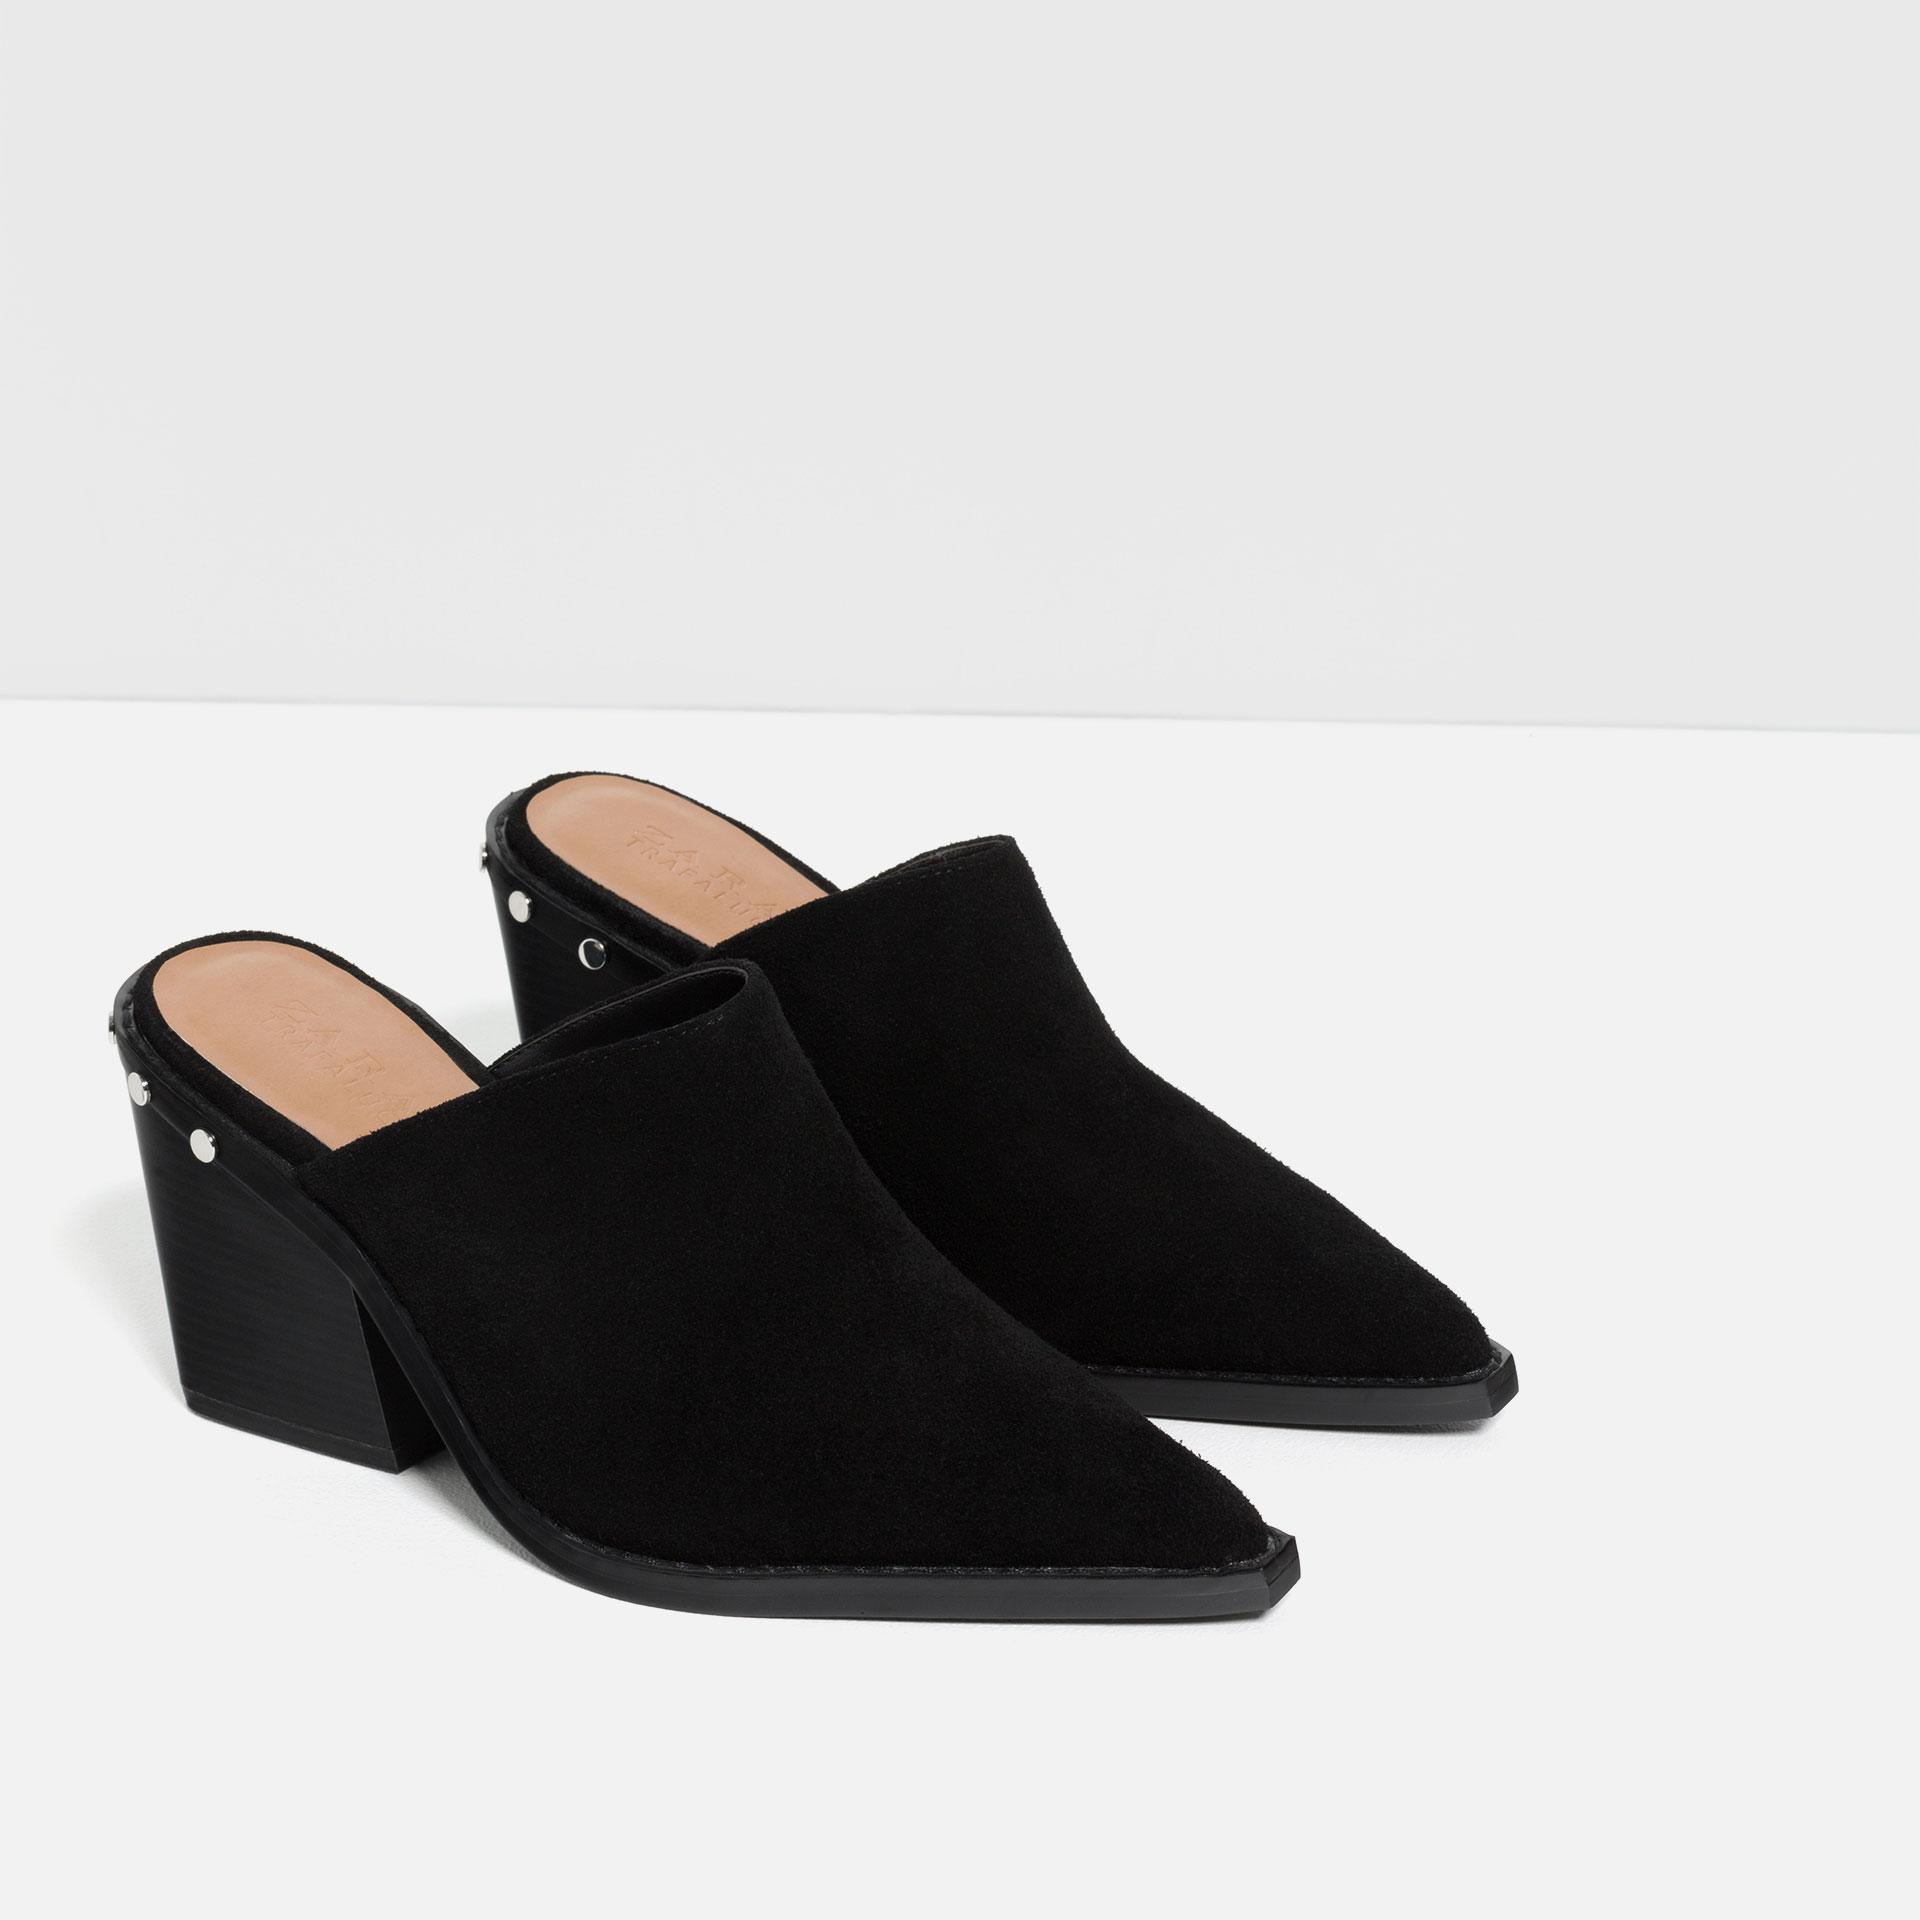 zara high heel mule shoes in black lyst